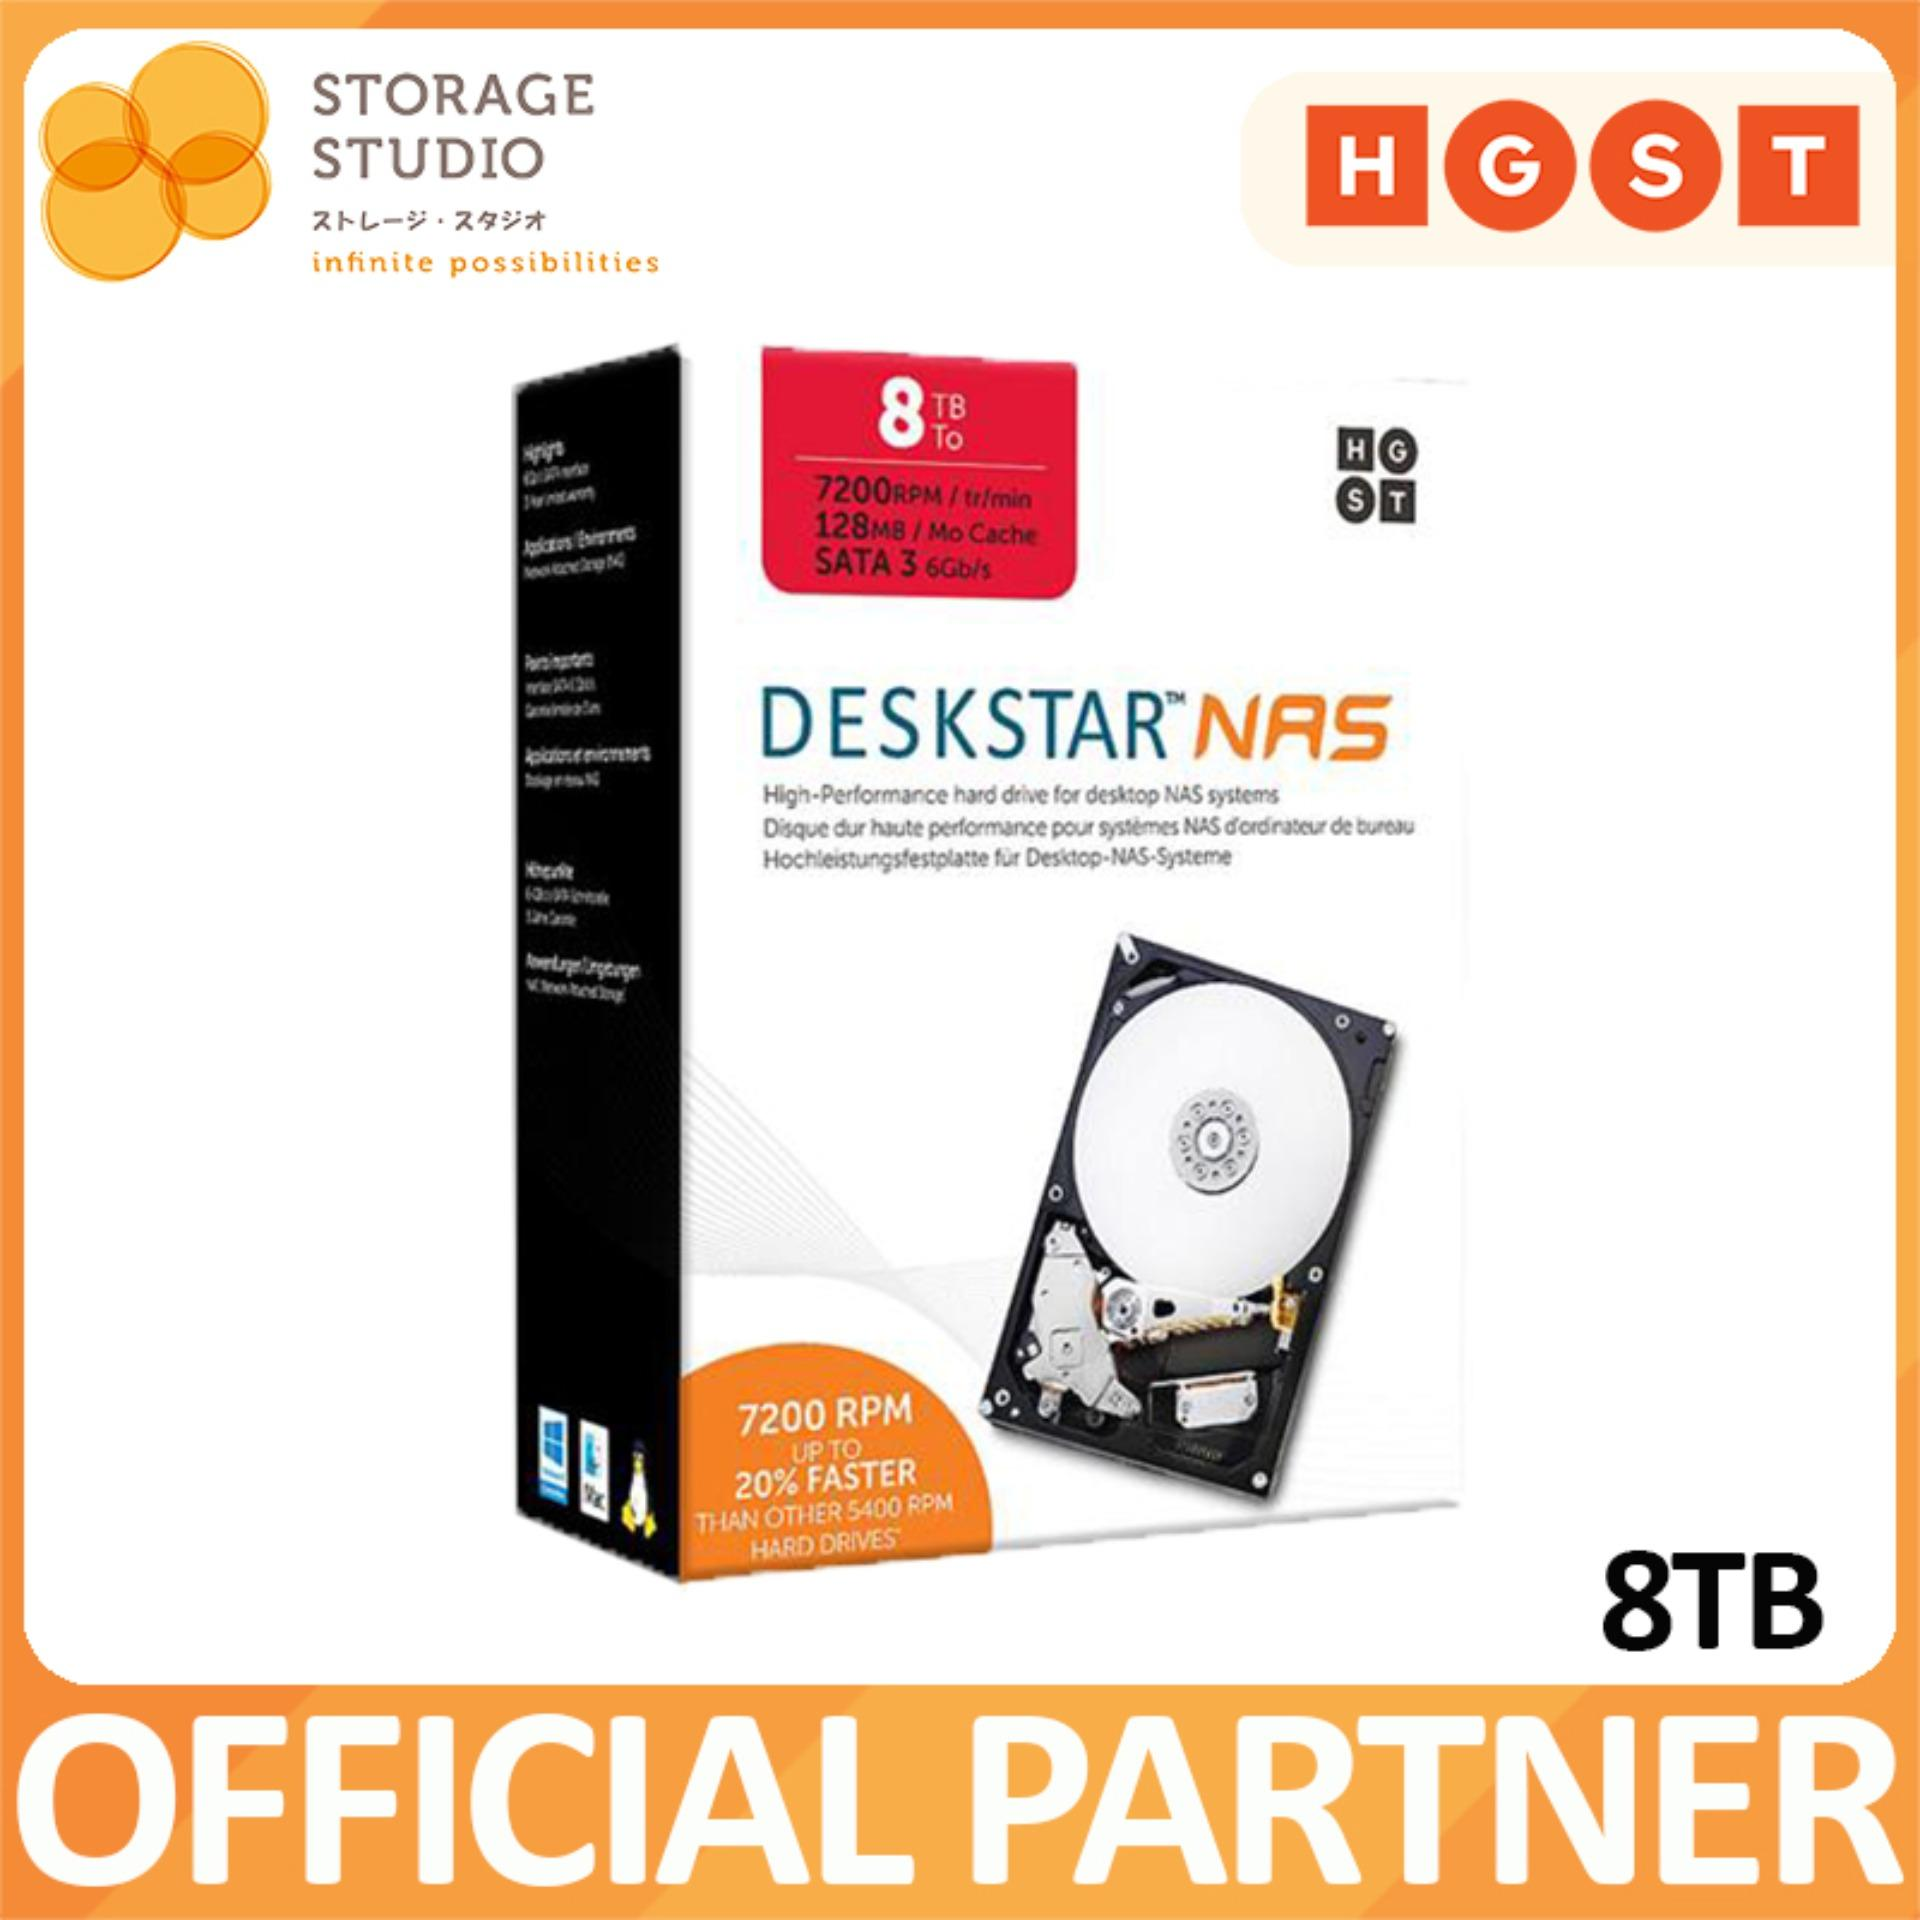 Compare Hgst Deskstar 8Tb Nas Hard Disk 8Tb Prices